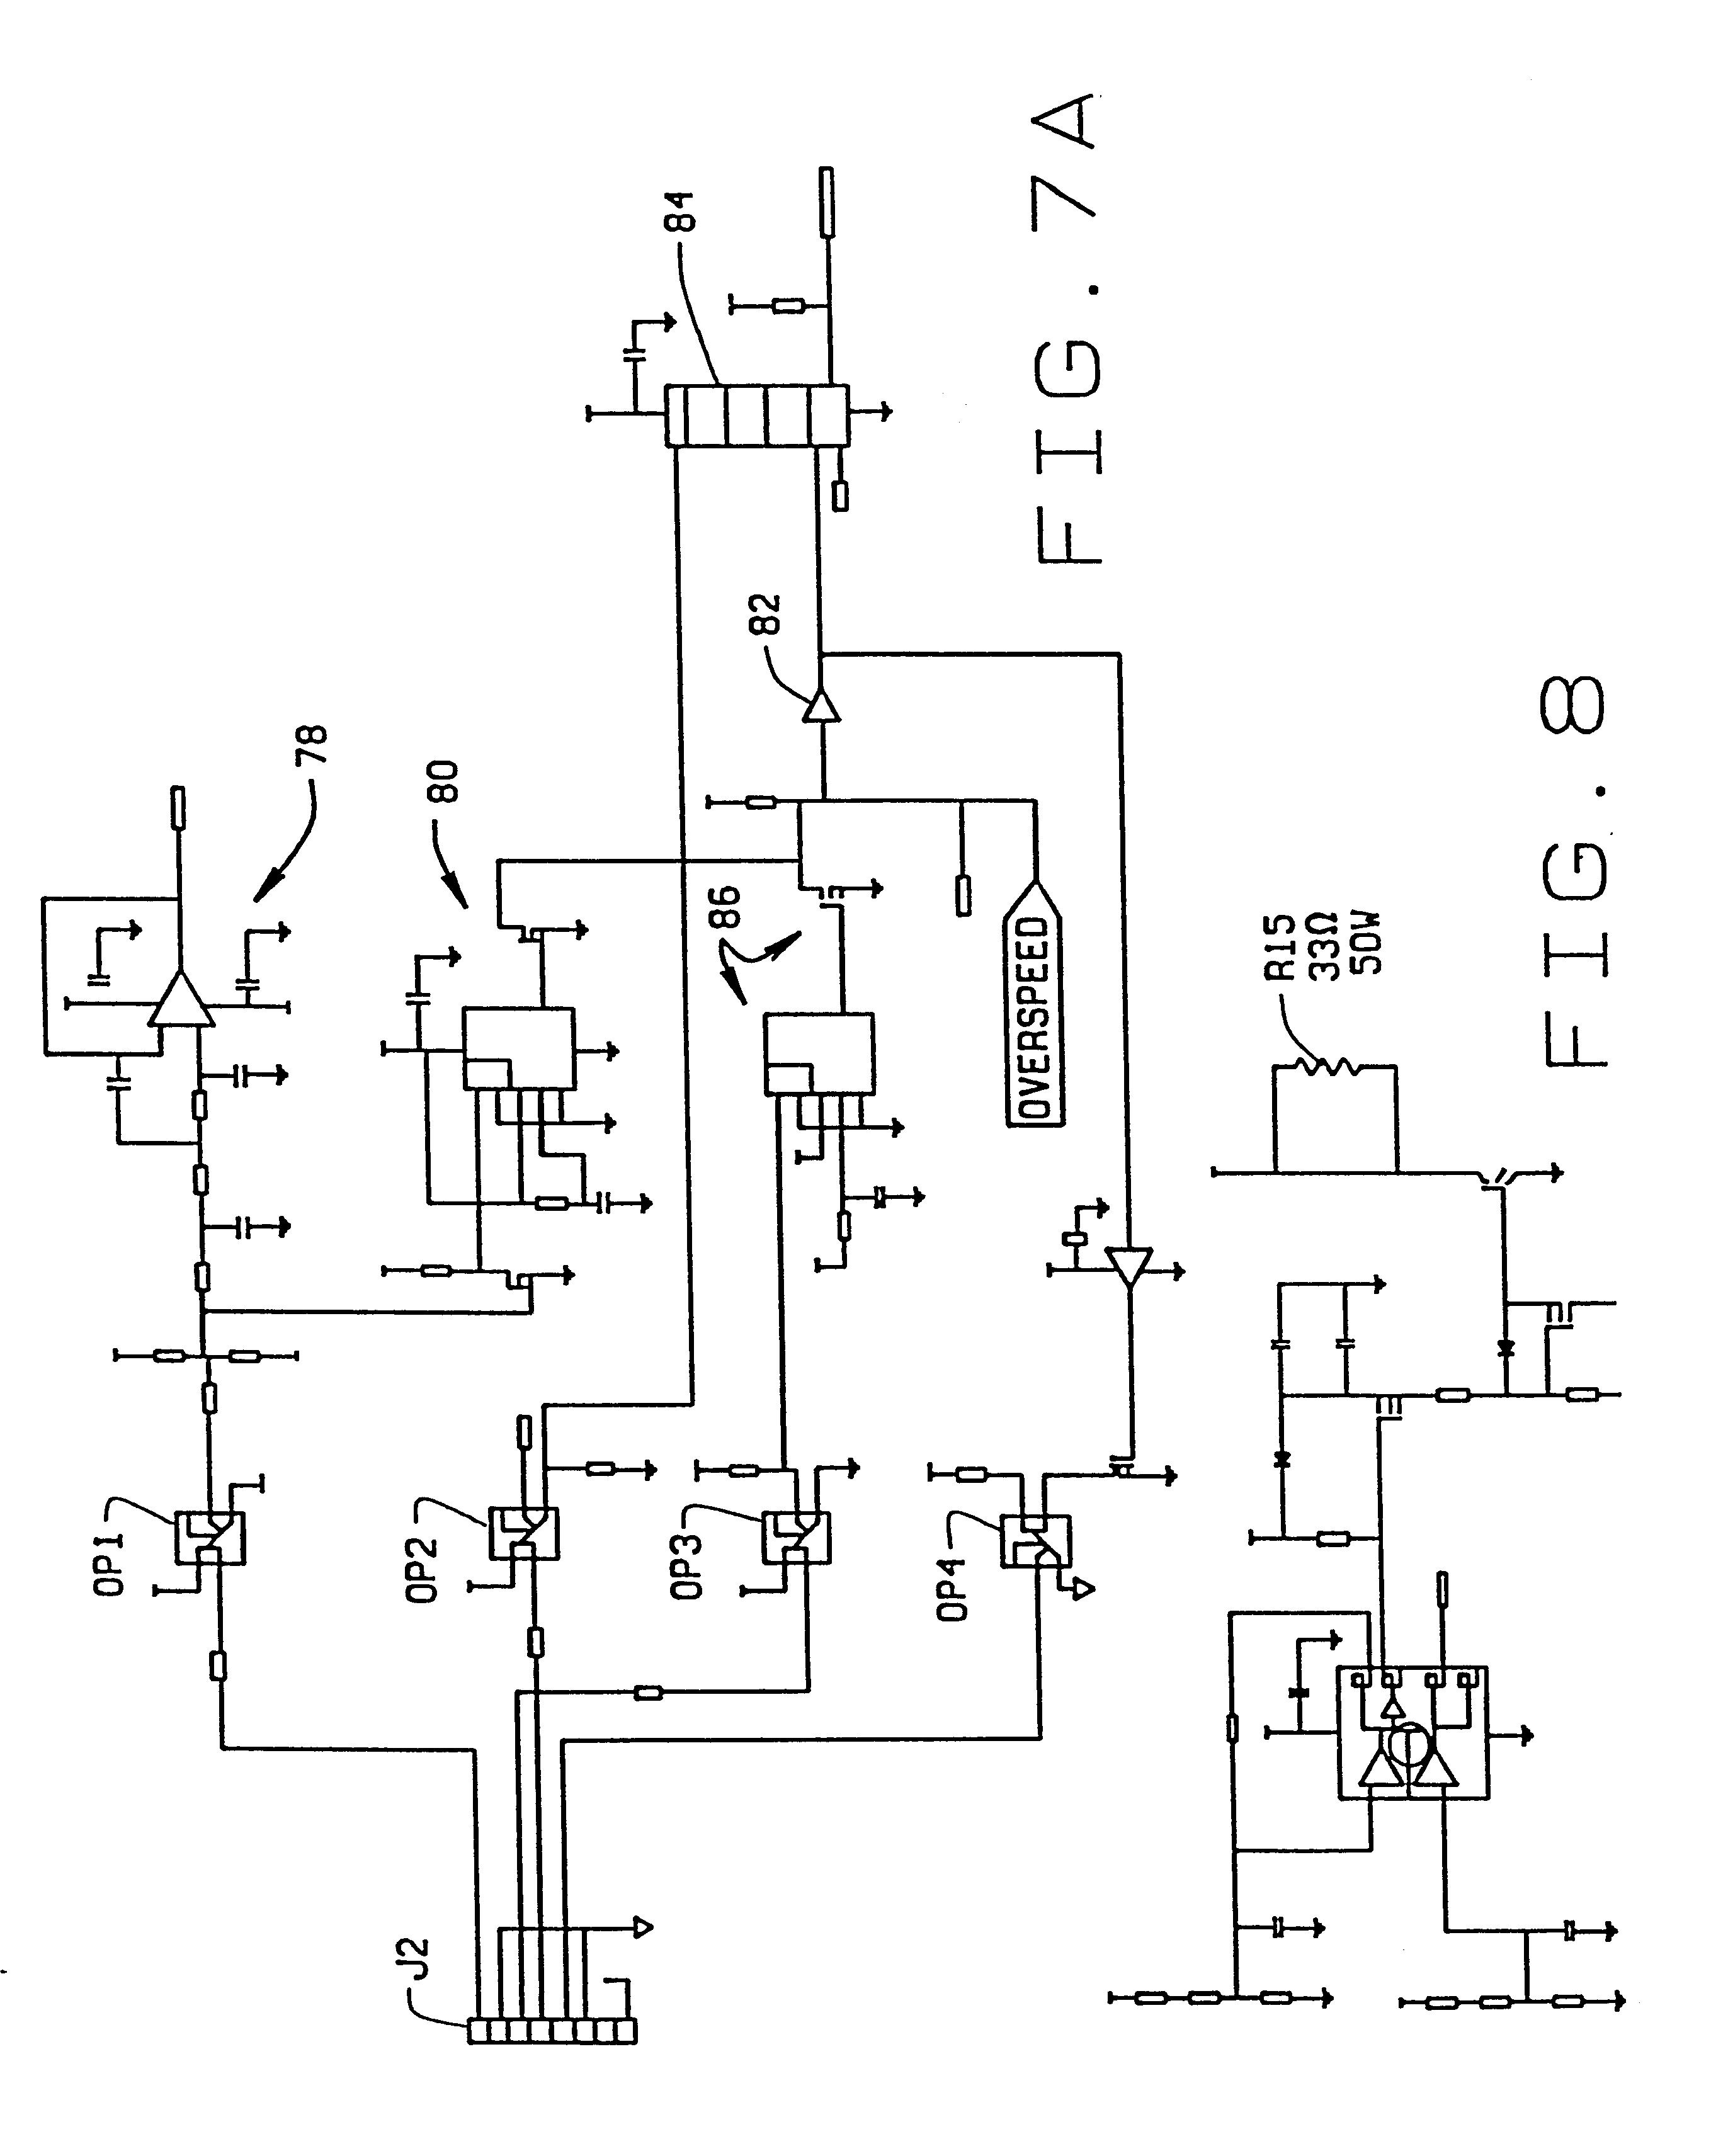 Demag Hoist Wiring Diagram Installation Iupac Gold Book Crane Brake Patent Us3971971 Overhead Outstanding Pierce Ideas Best Image Engine Us06336364 20020108 D00005 Diagramasp